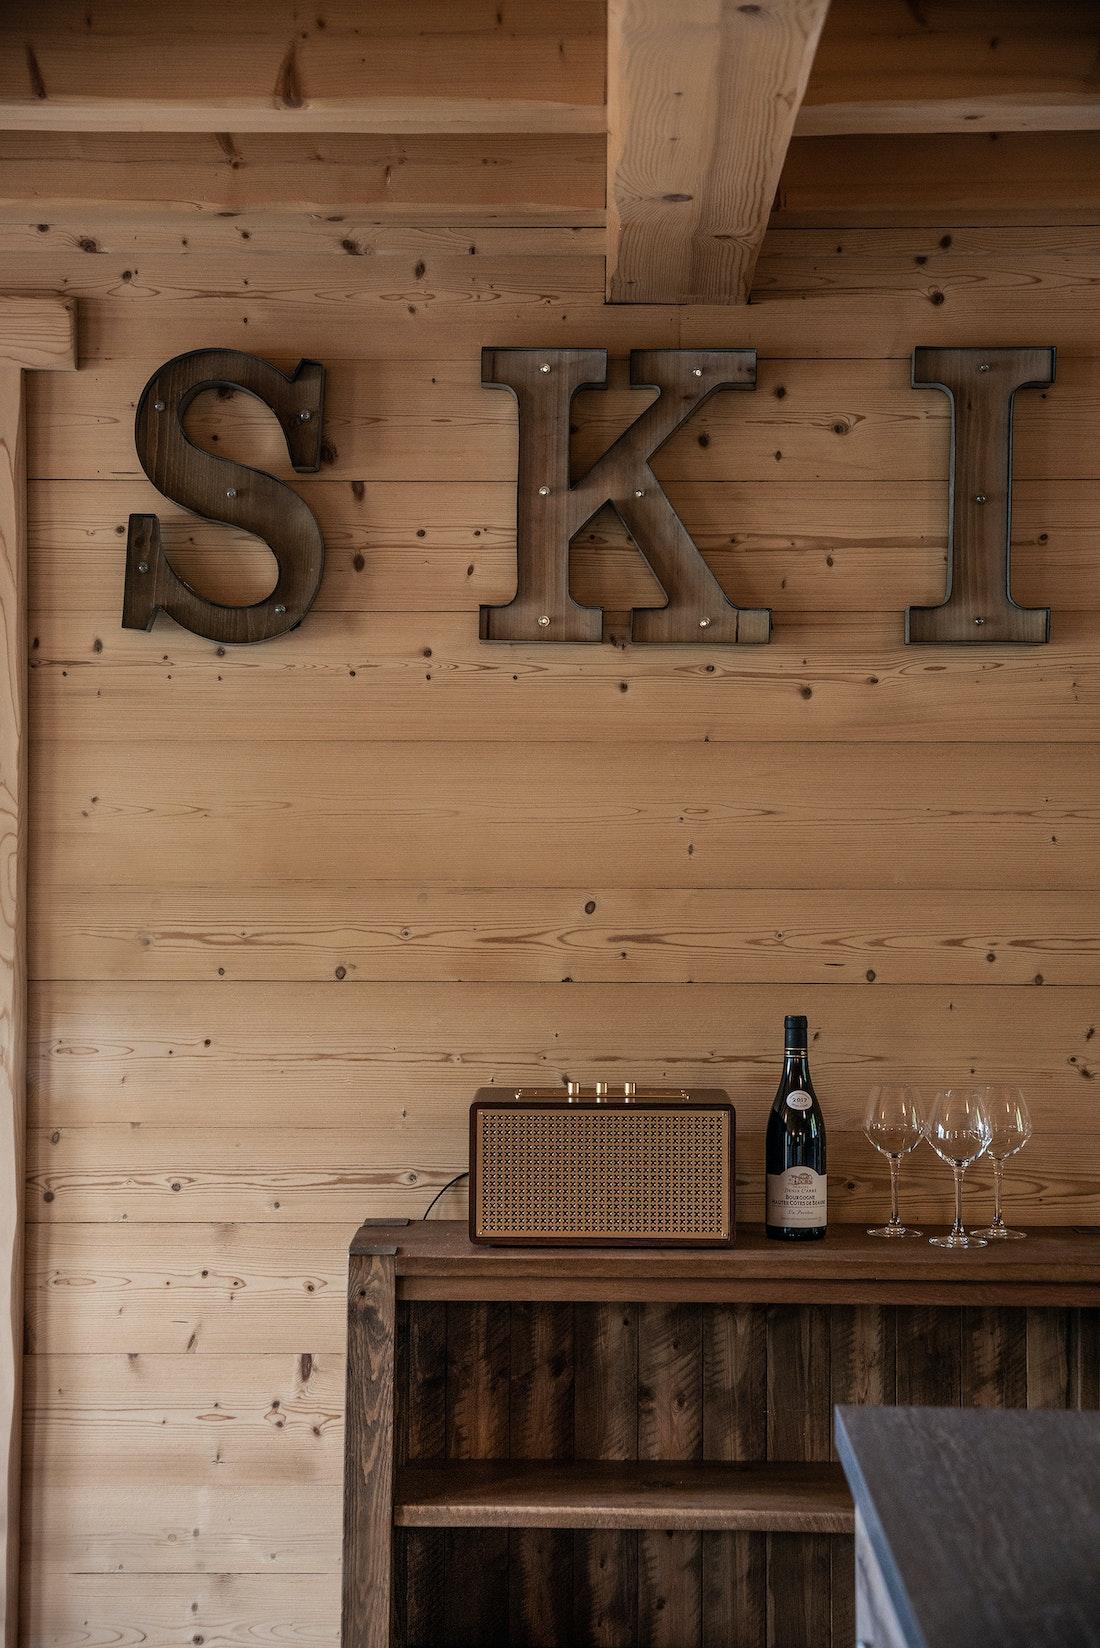 SKI wooden sign in the living room of Balata luxury chalet in Morzine